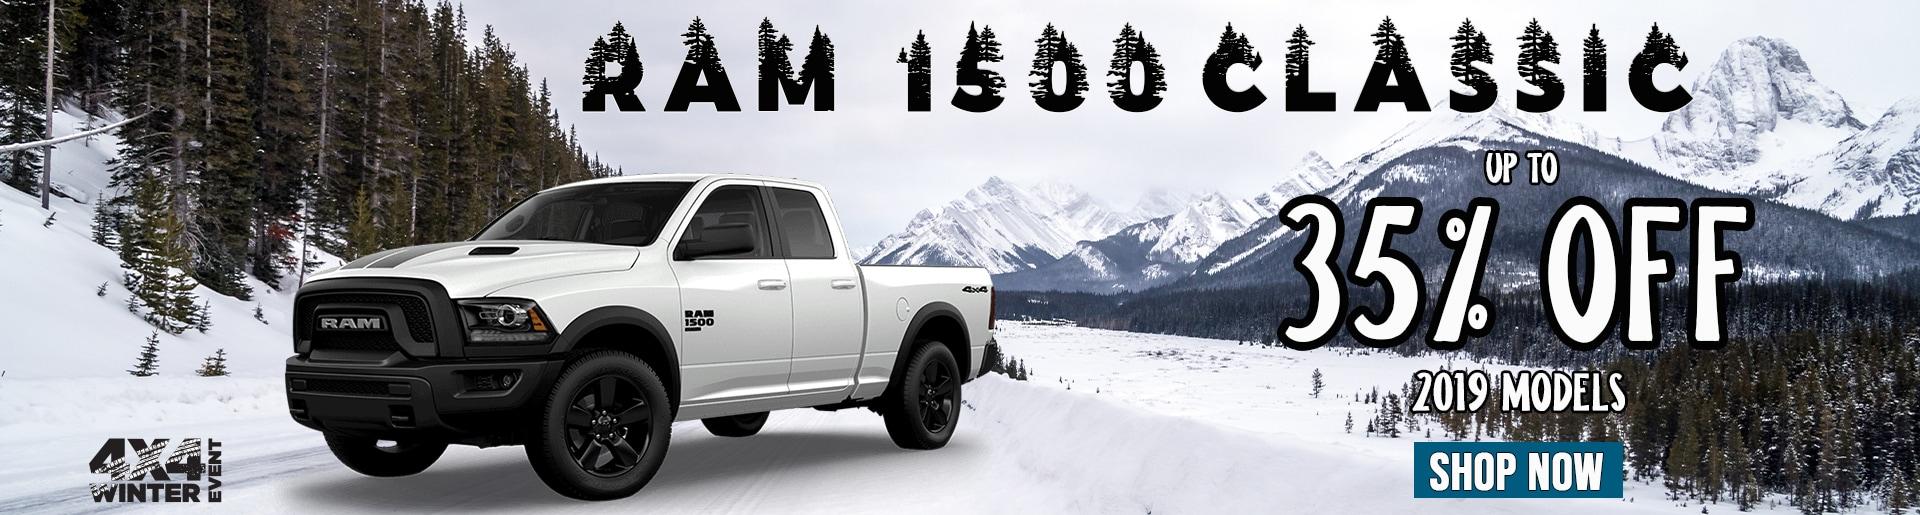 New 2019 & 2020 Chrysler, Jeep, Dodge, Ram & Used Car ...